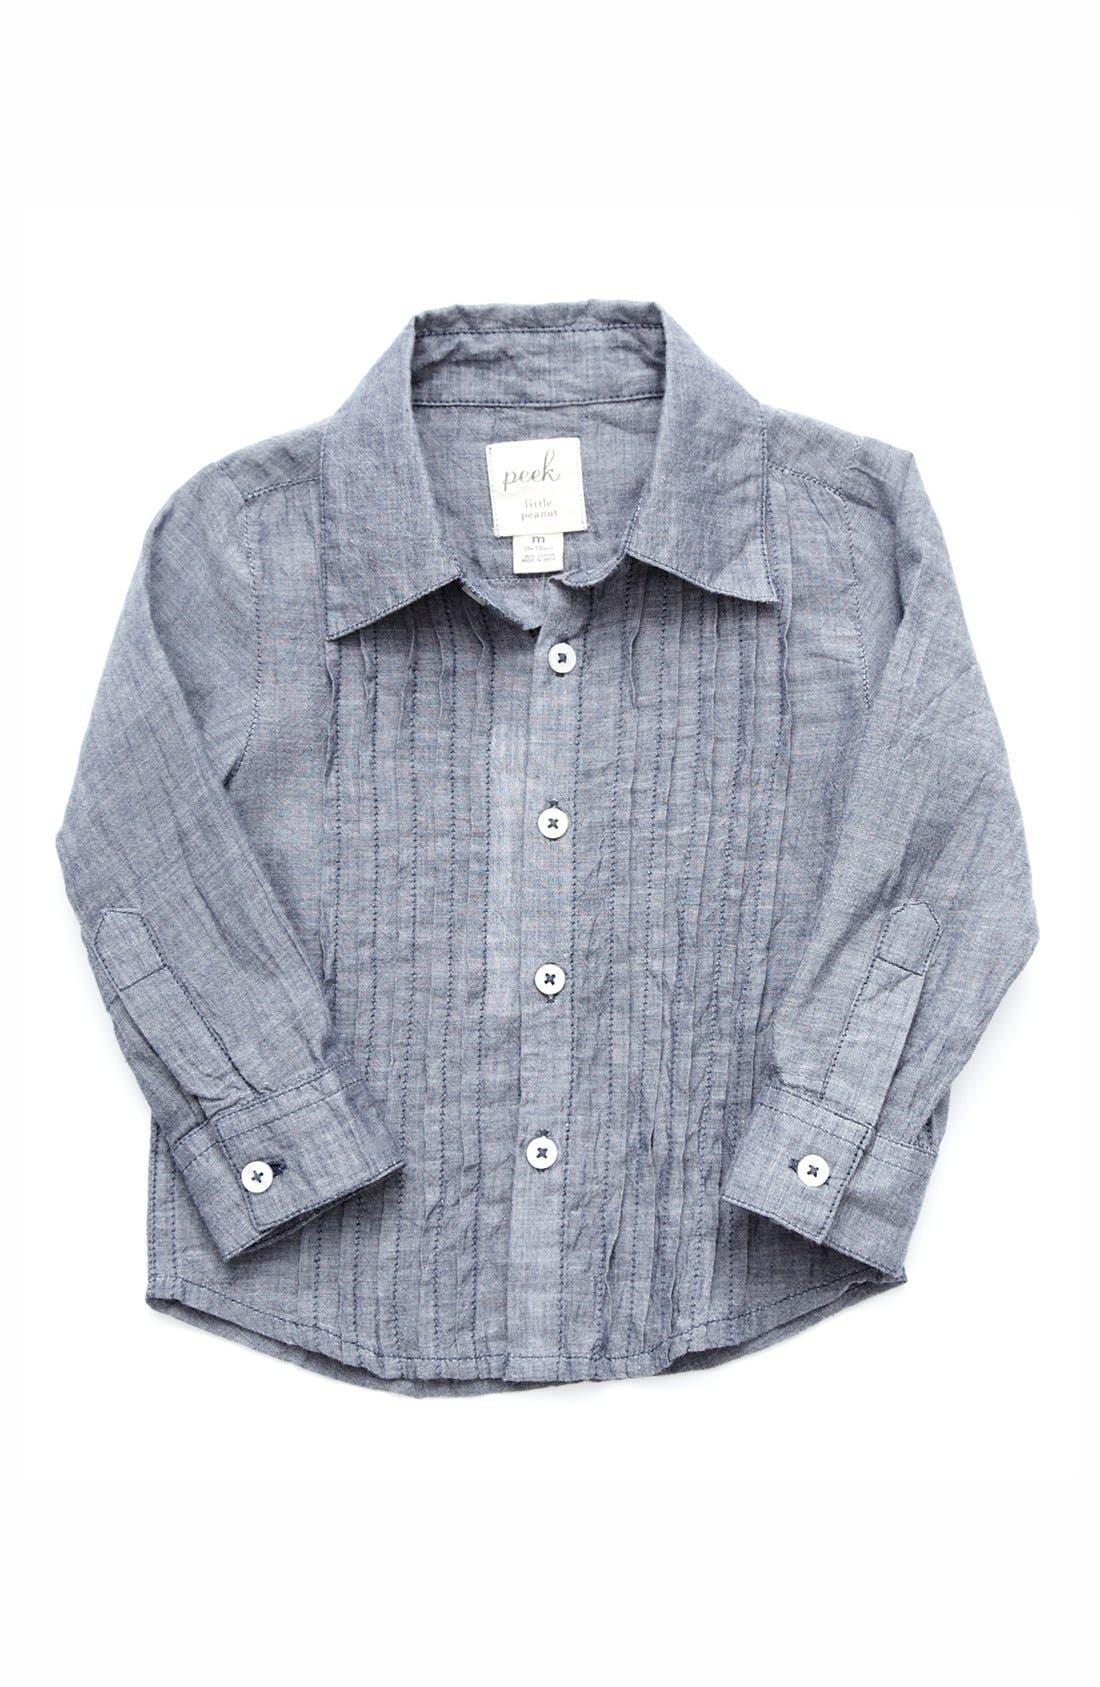 Alternate Image 1 Selected - Peek 'Arthur' Chambray Sport Shirt (Baby Boys)